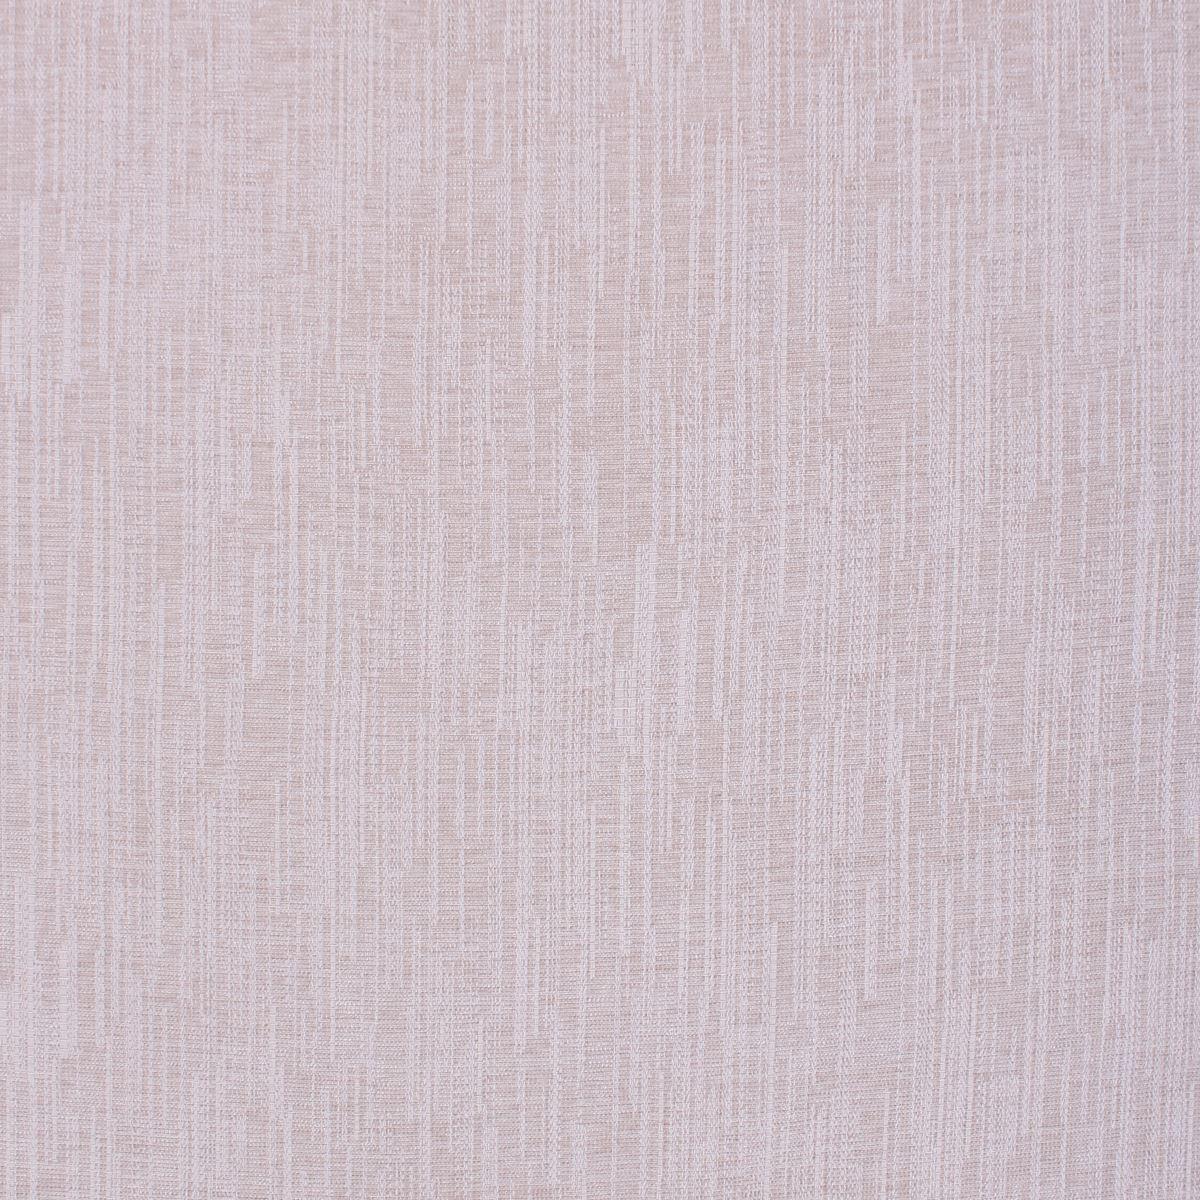 034-Chenille-034-Slubbed-Shabby-Worn-Look-Curtain-Cushion-Sofa-Upholstery-Fabric thumbnail 39